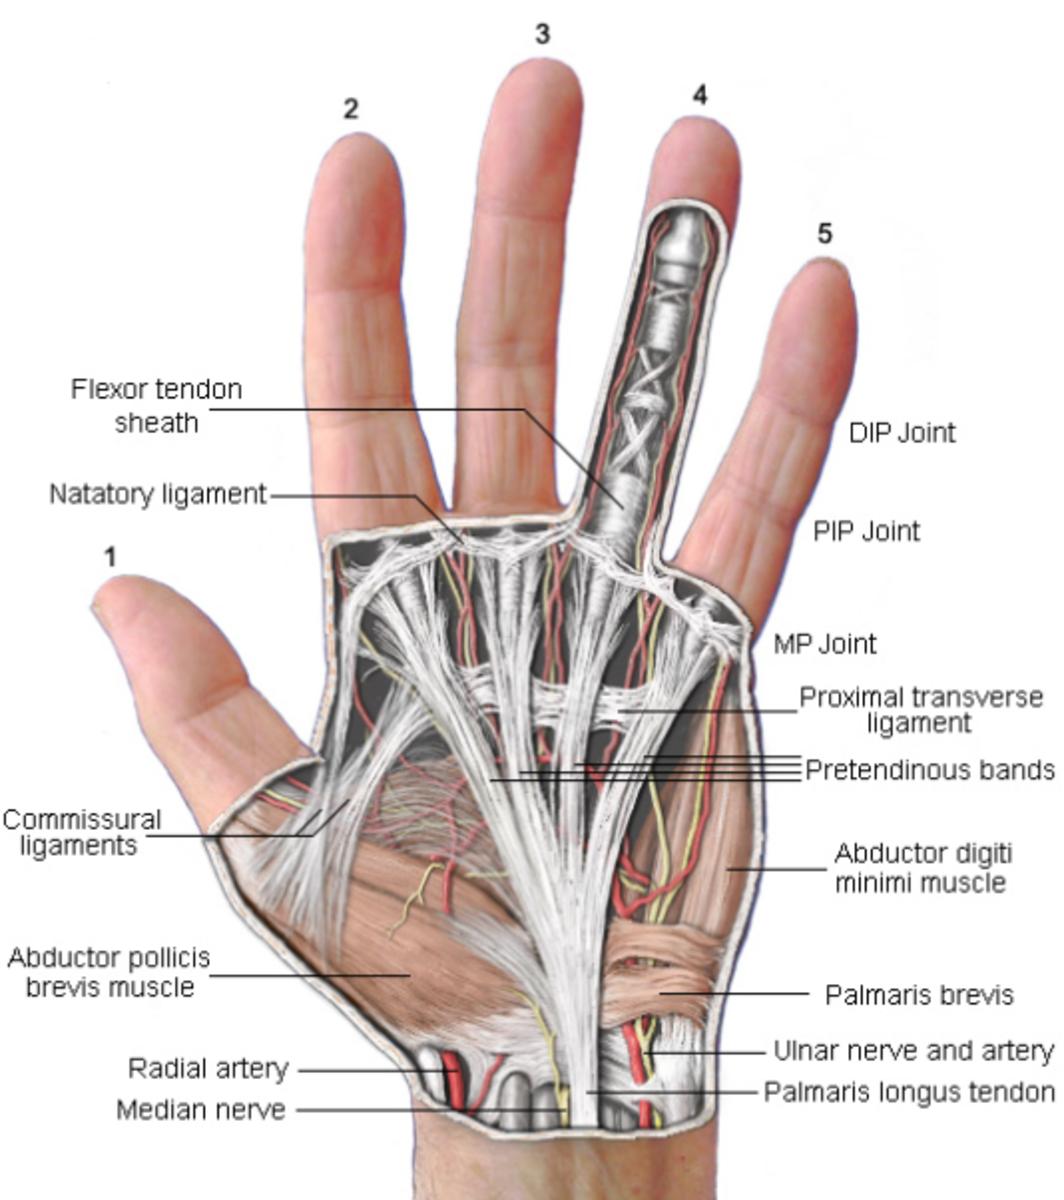 Anatomy of the hand.